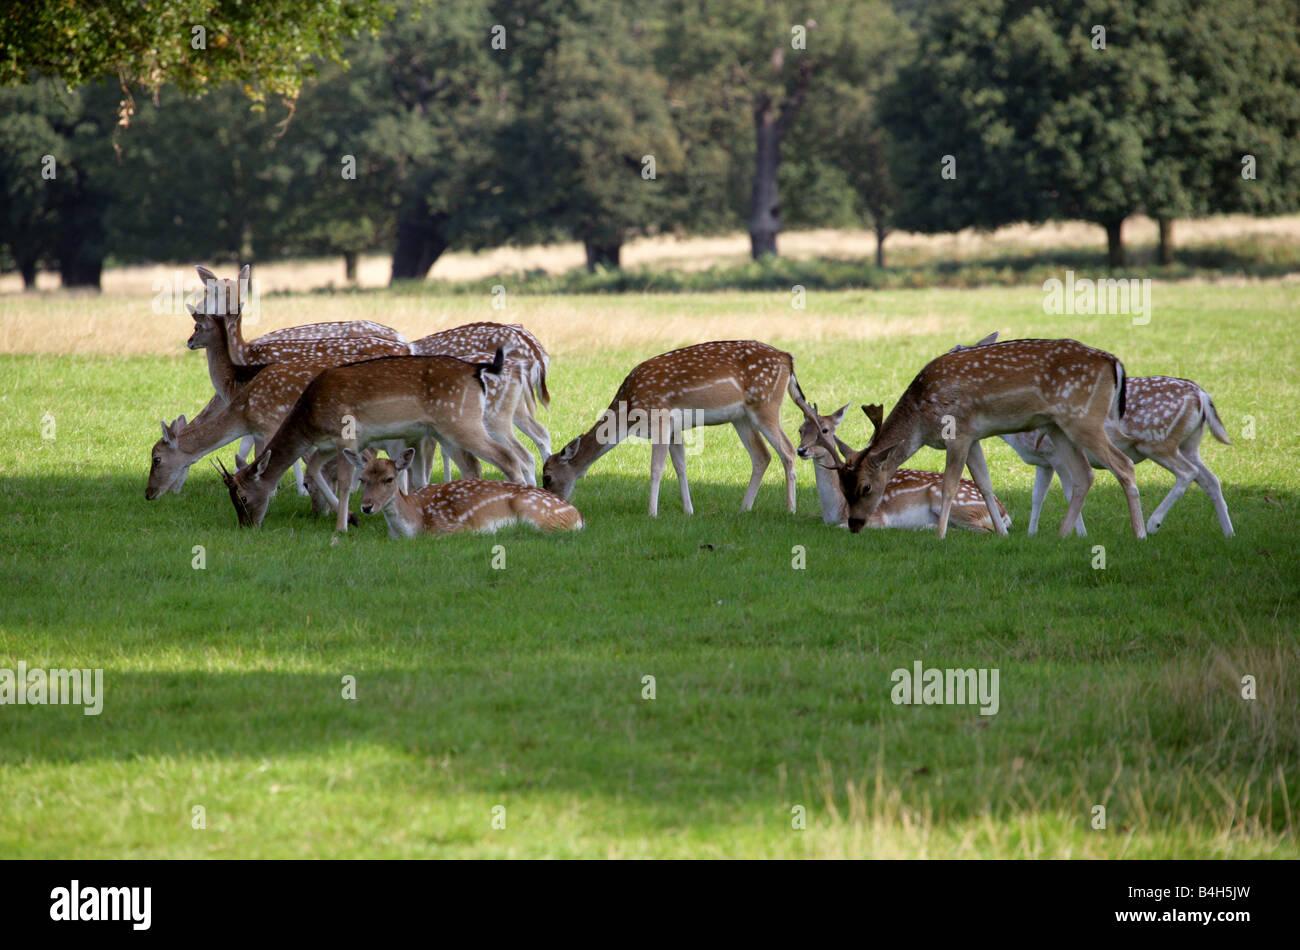 European Fallow Deer, Dama dama - Stock Image